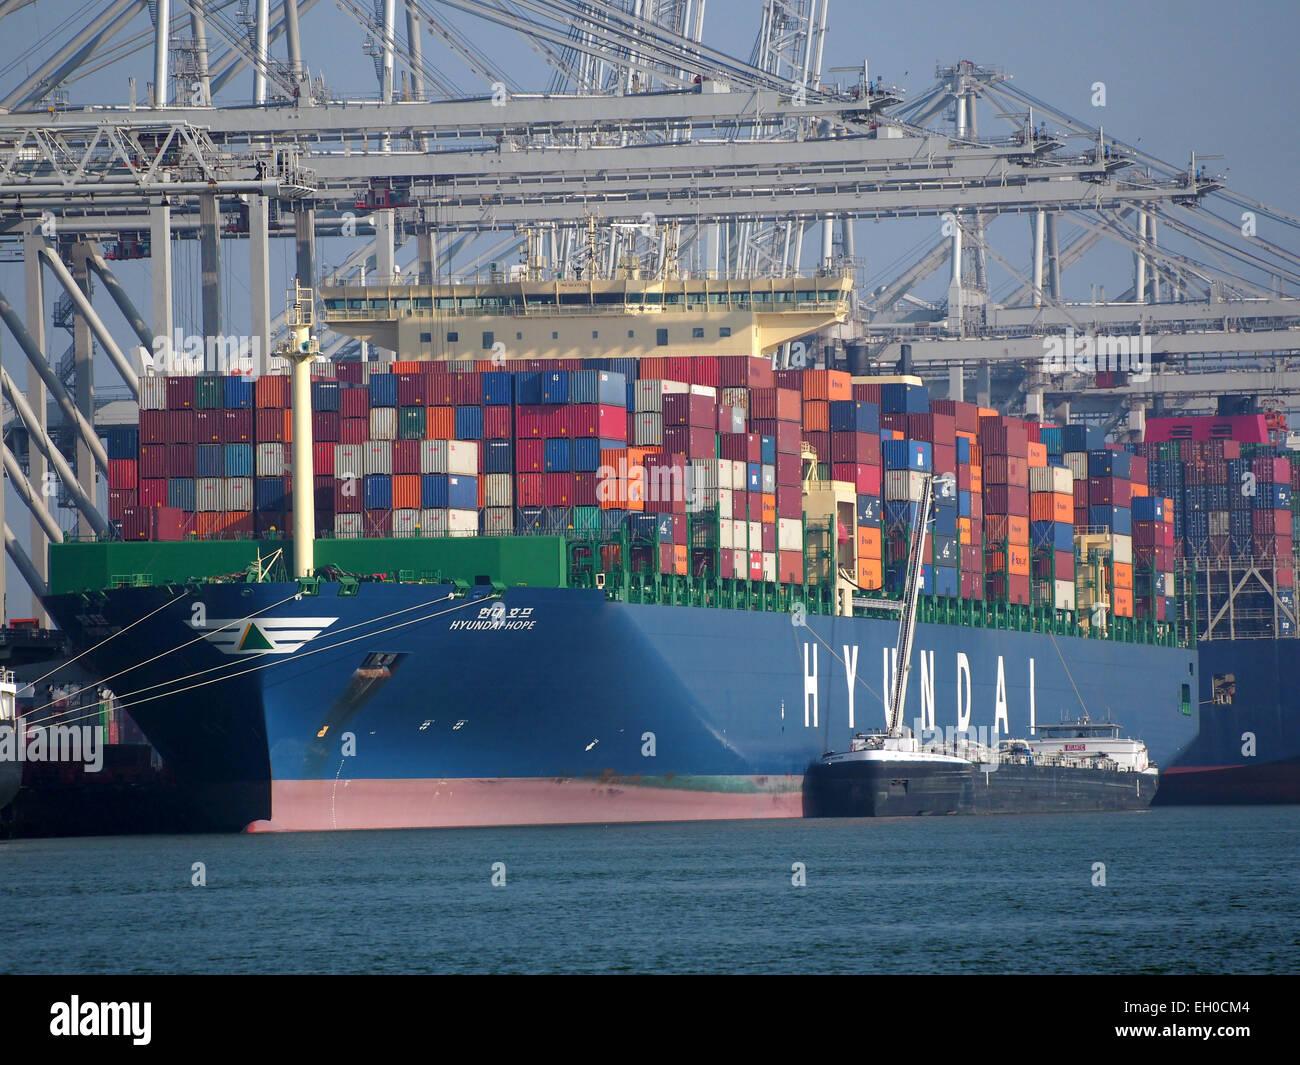 Hyundai Hope - IMO 9637234 & Atlantic Prestige ENI 02333489, Amazonehaven, Port of Rotterdam, pic6 - Stock Image